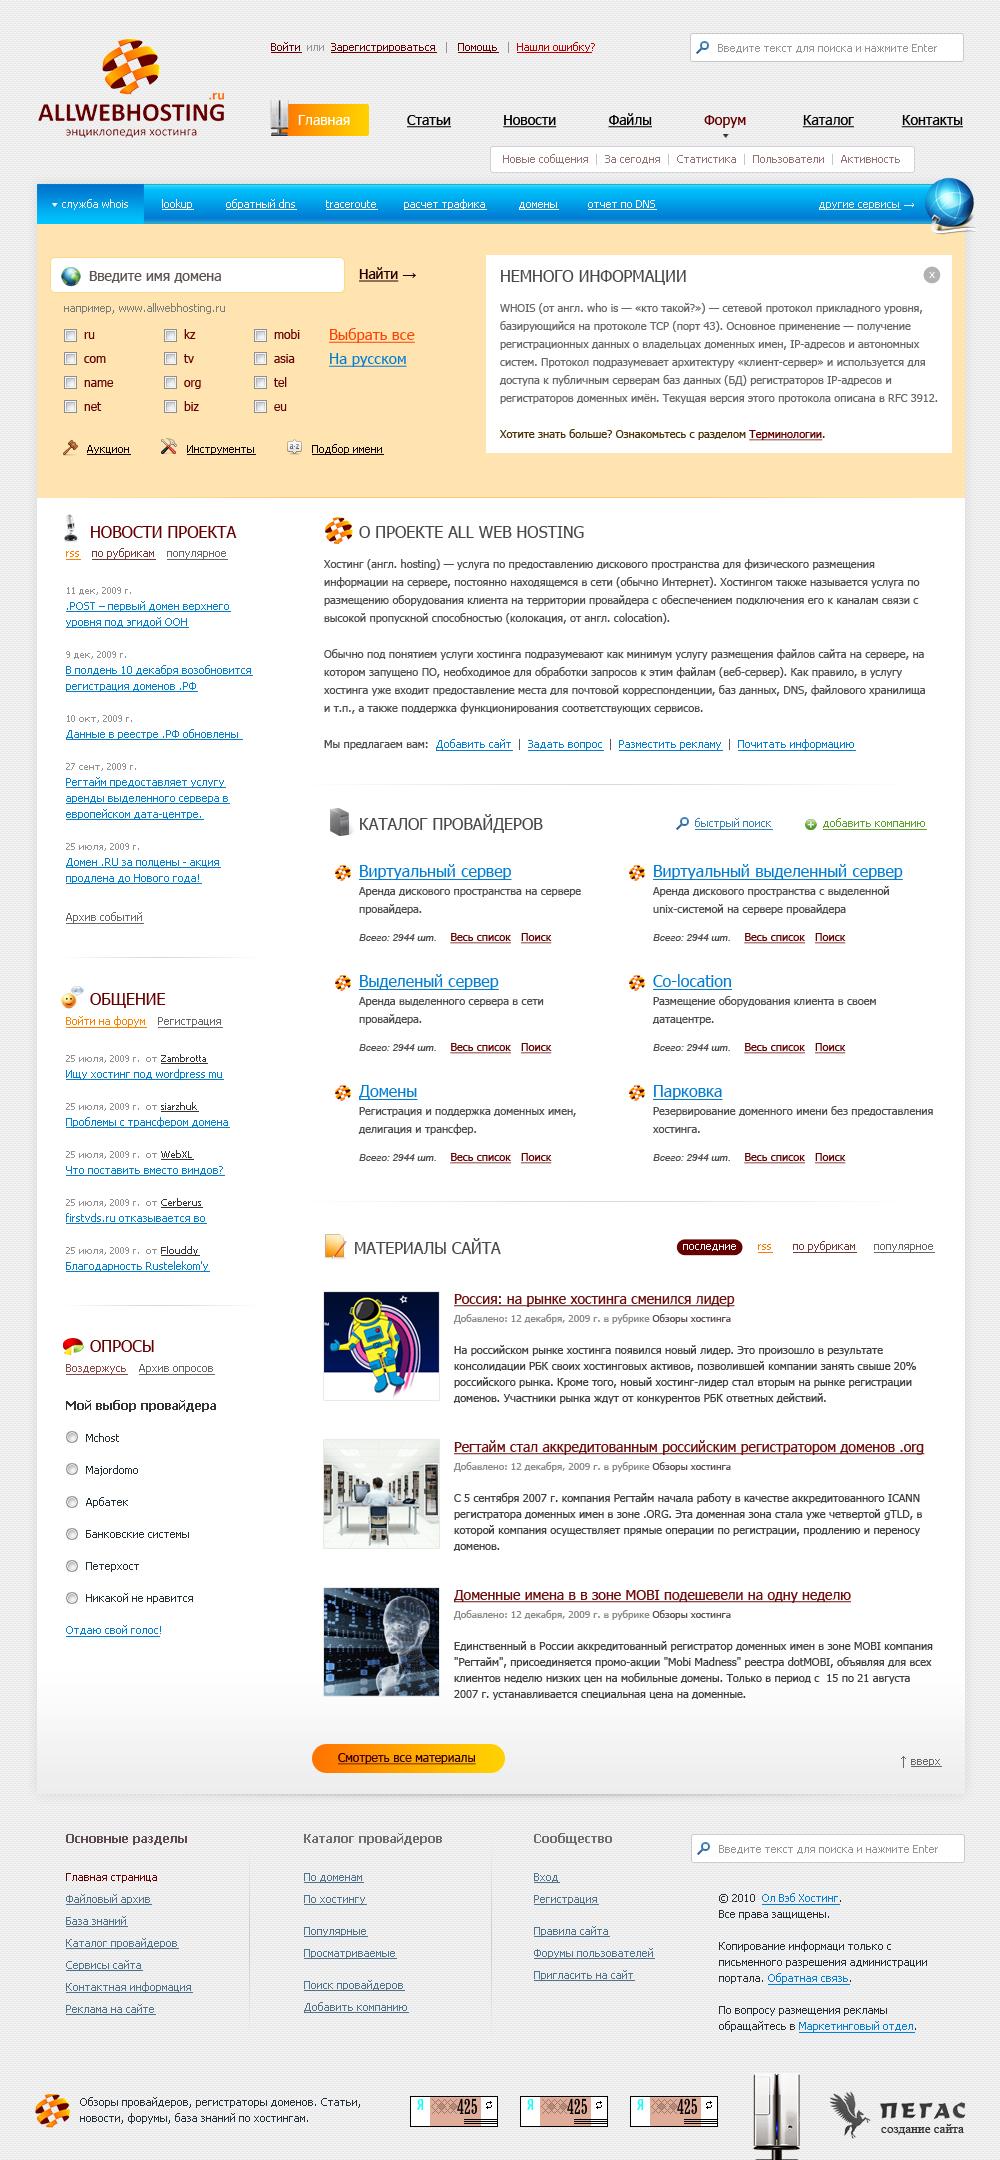 Регтайм хостинг при оплате хостинга домен бесплатно